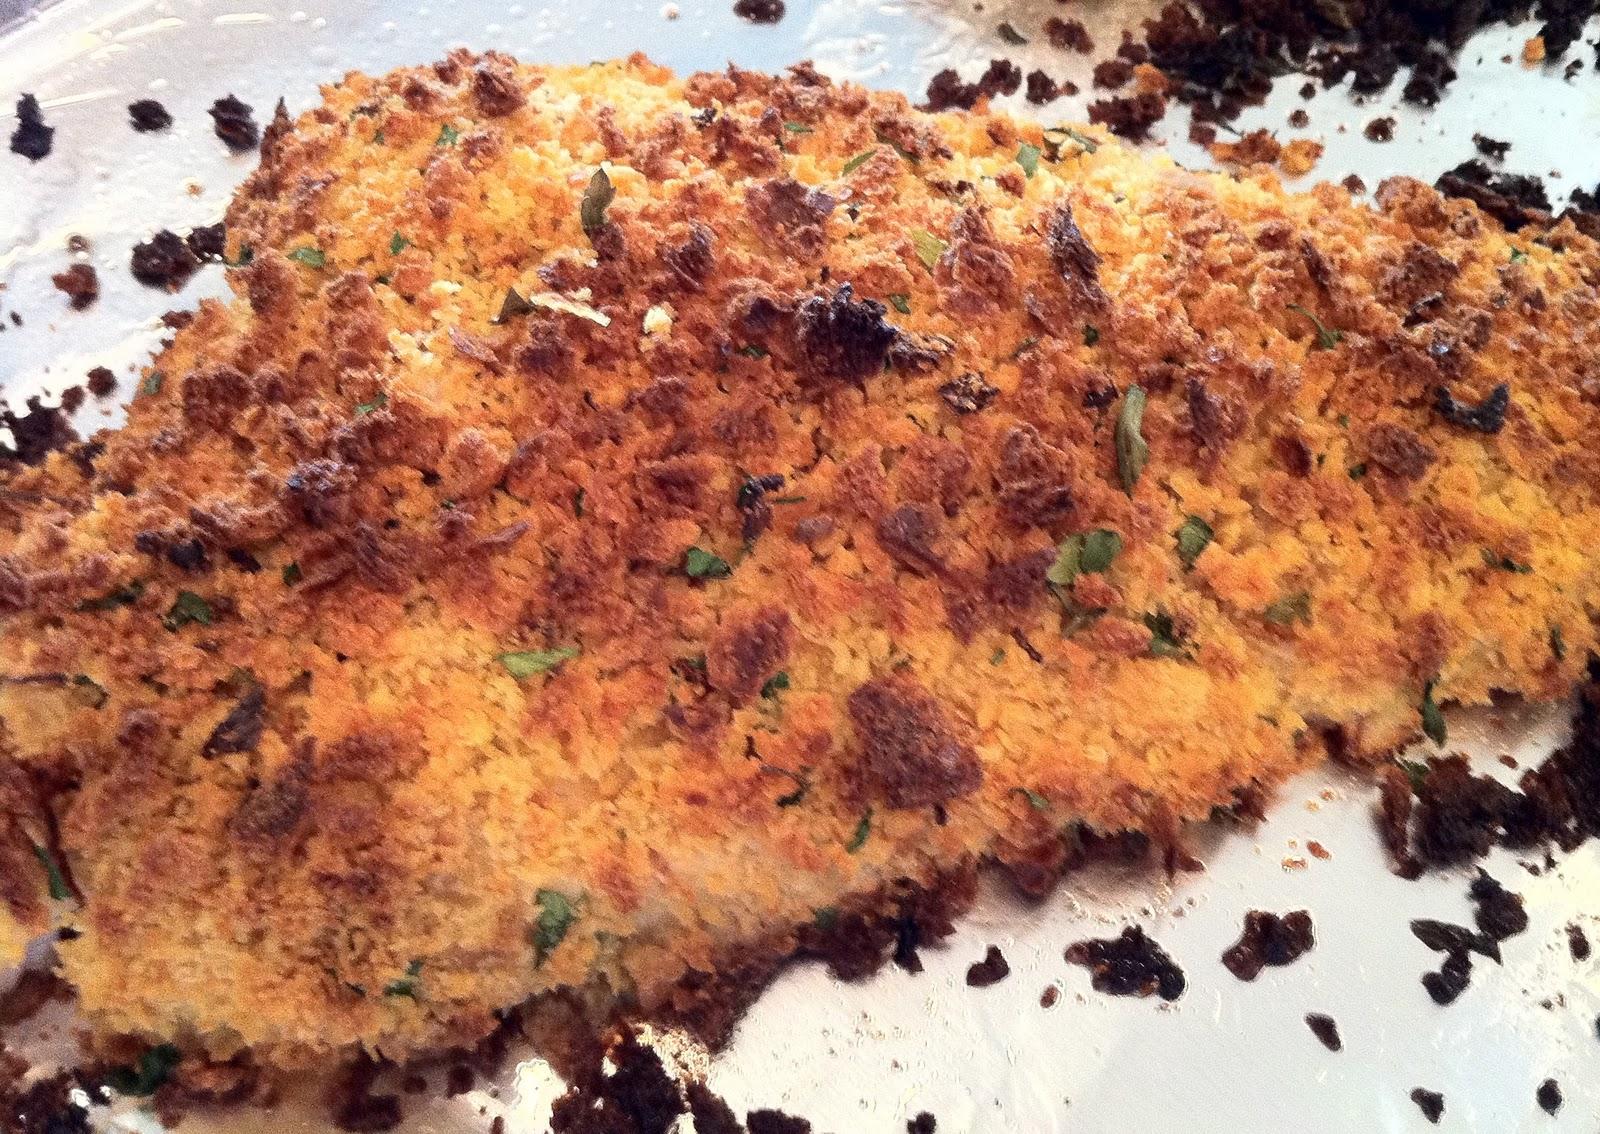 Crunchy Baked Haddock & Tartar Sauce - Recipes4EveryKitchen